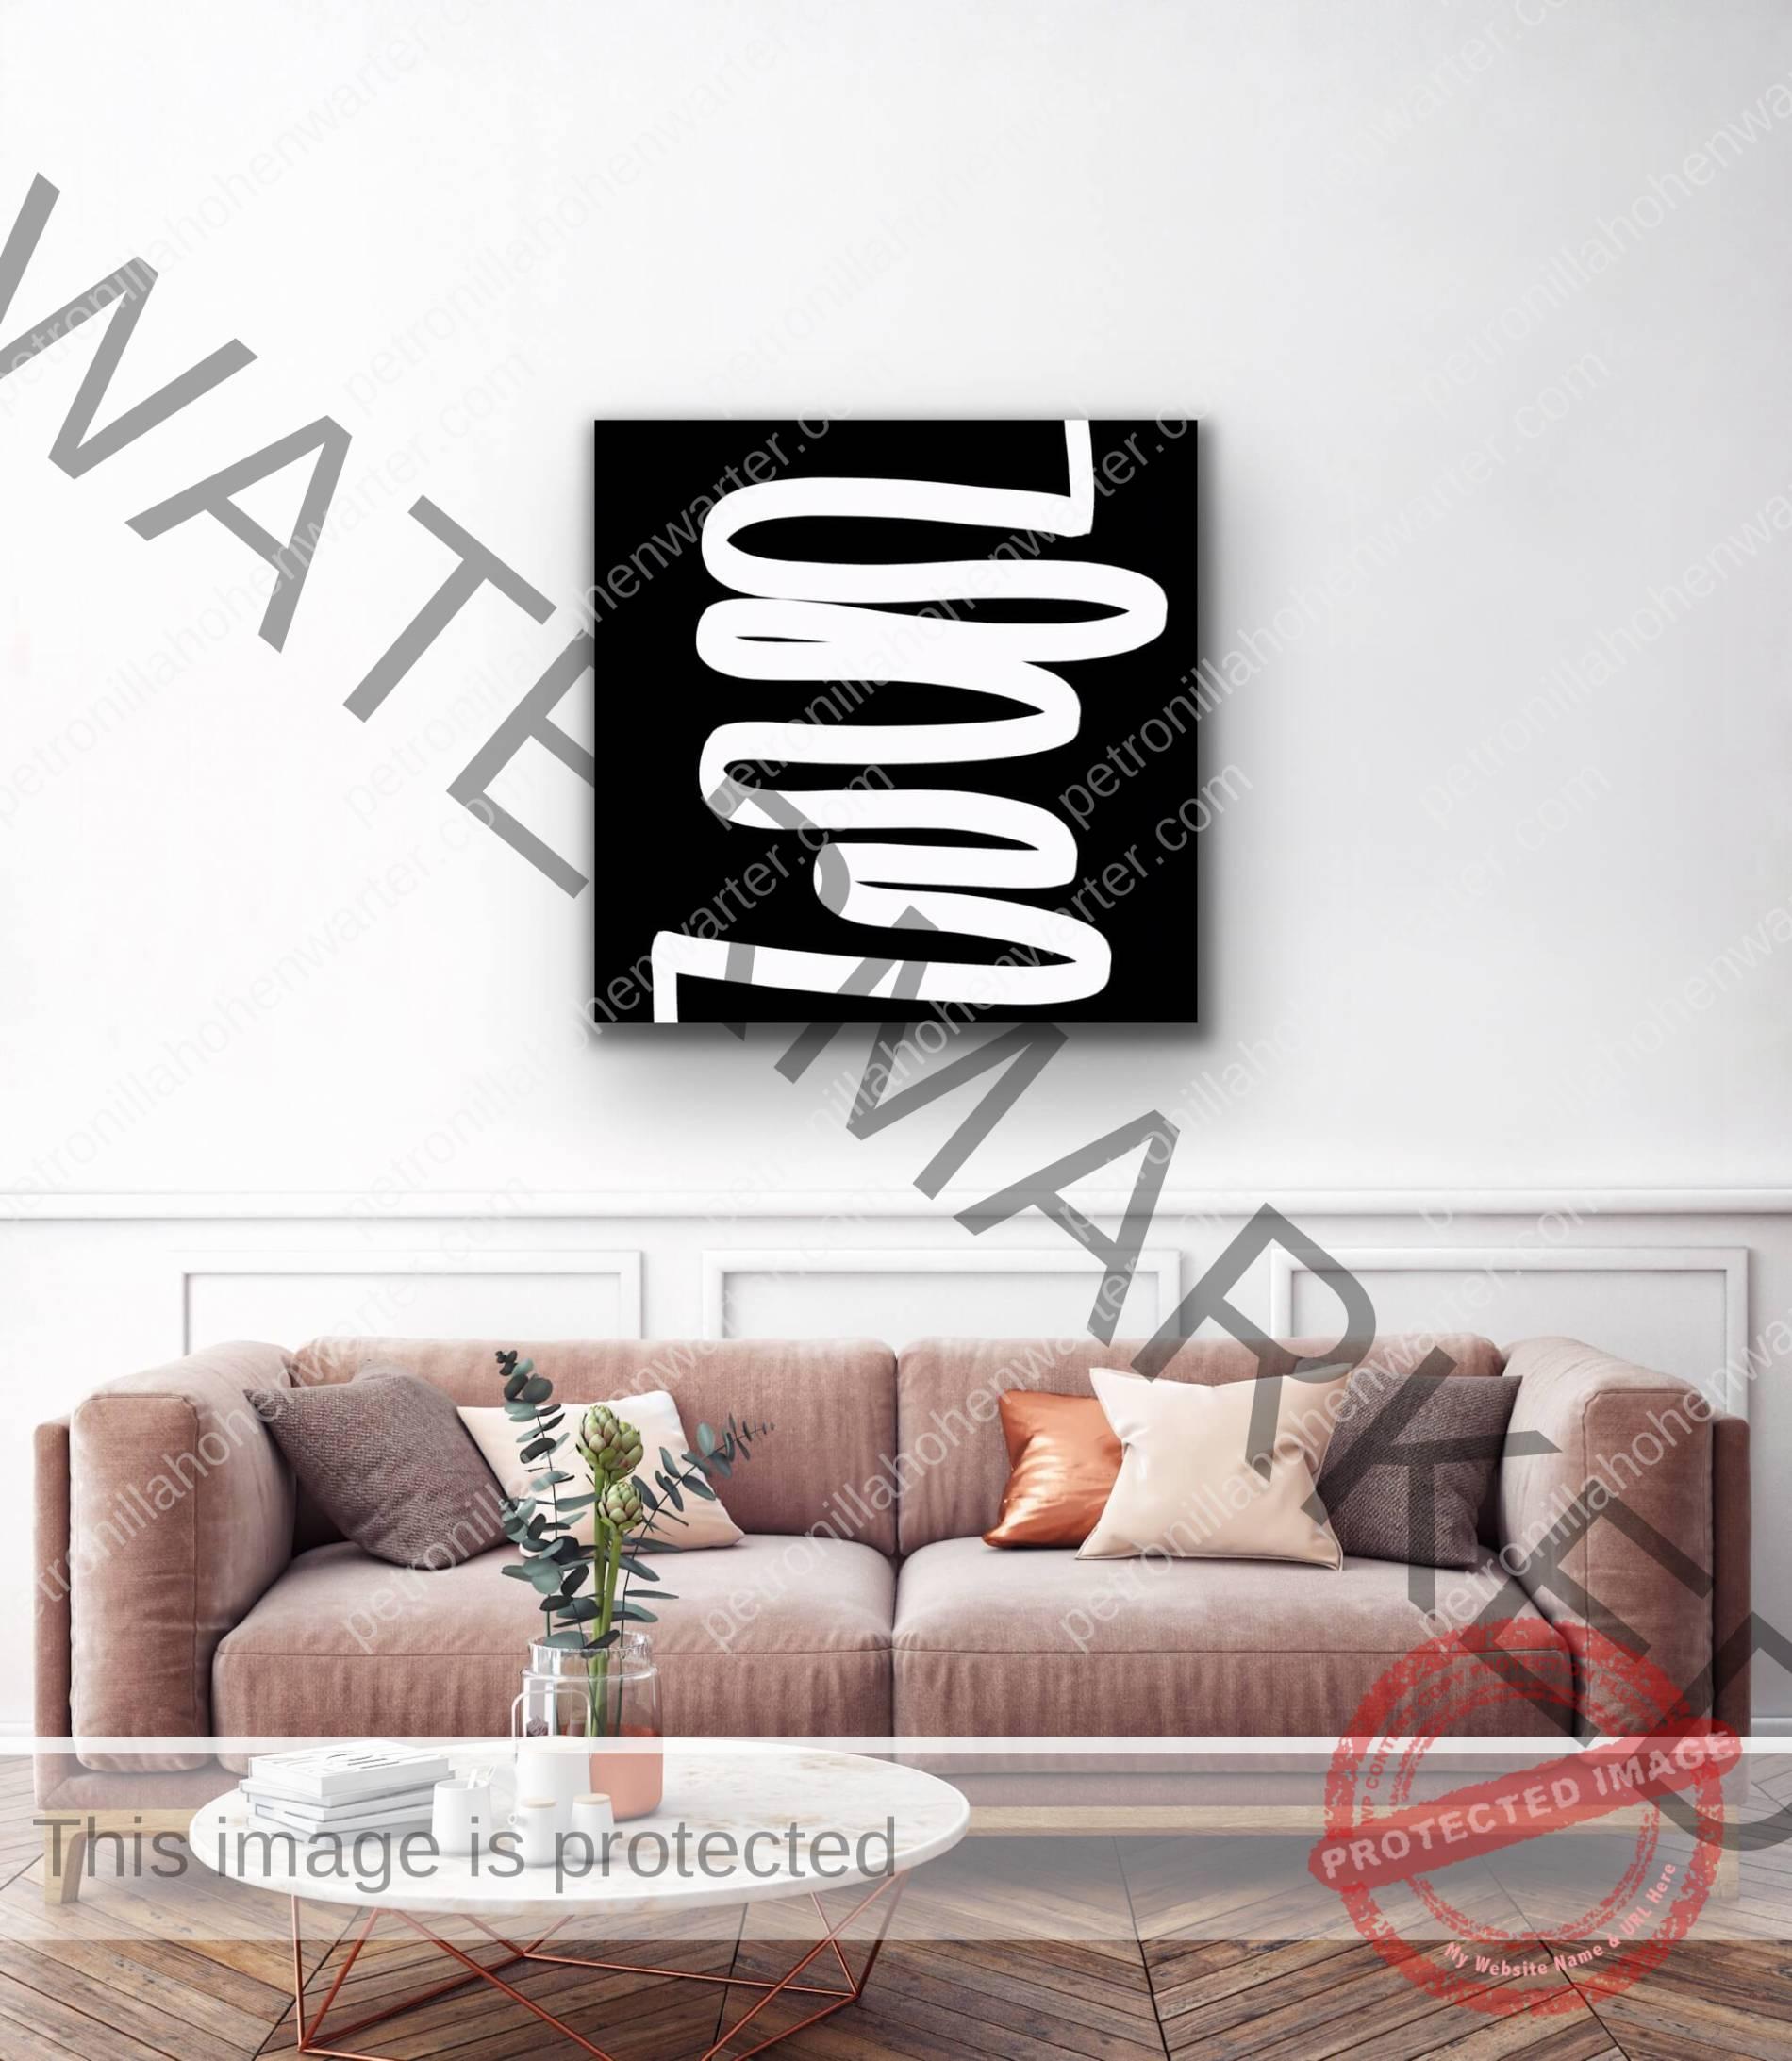 essntials art and living interior design digital drawing digital artwork petronilla hohenwarter affordable art